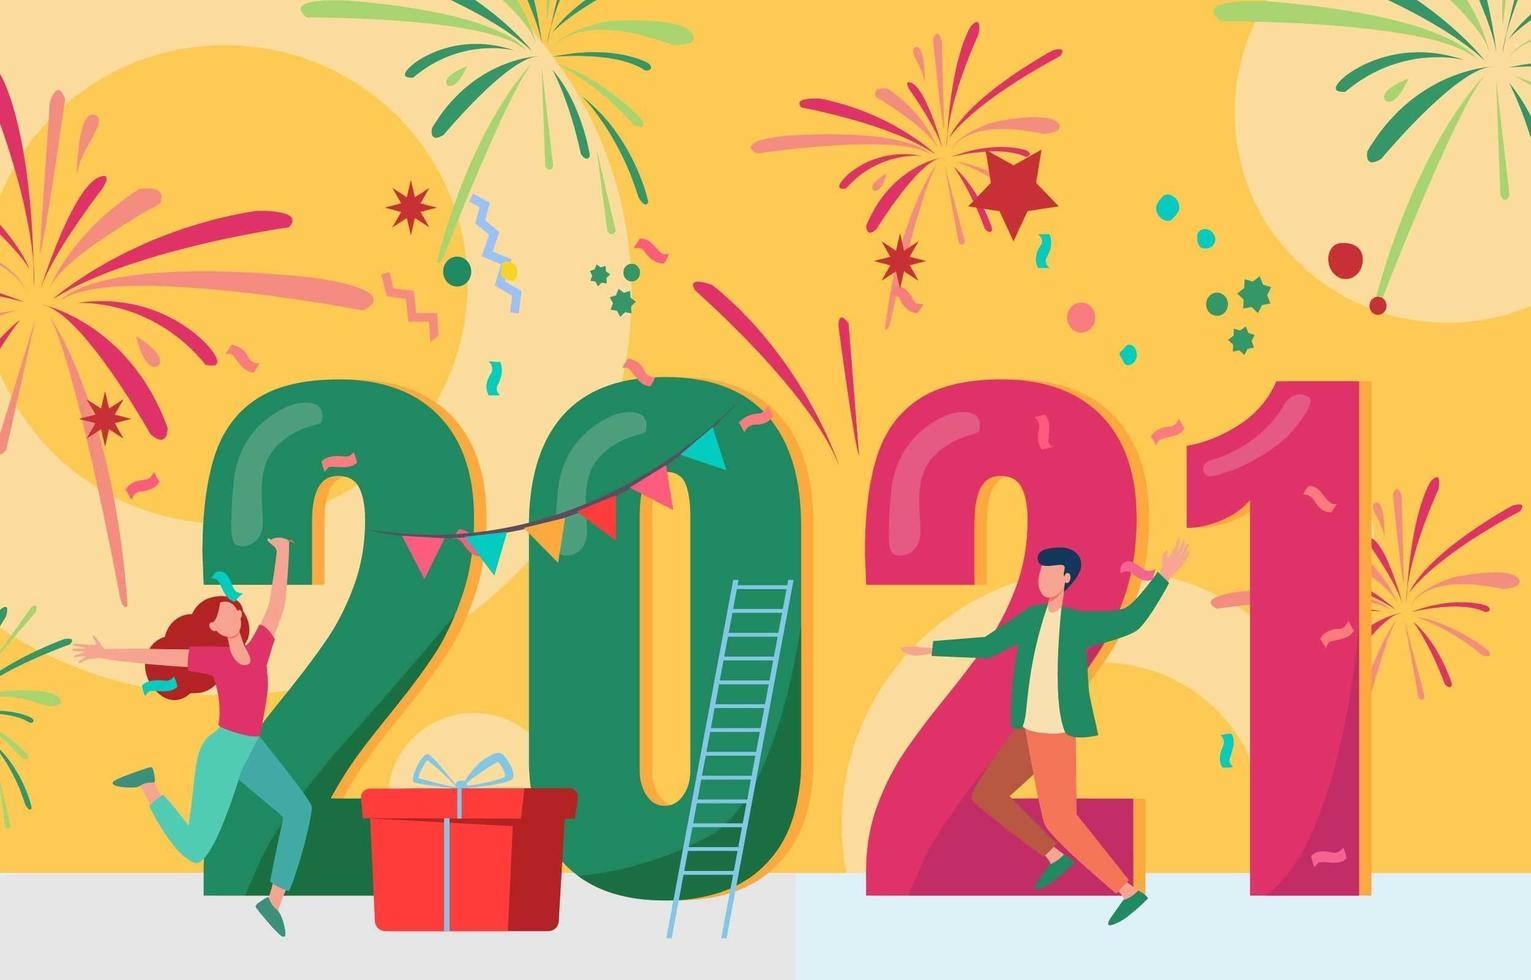 2021 New Year Celebration vector